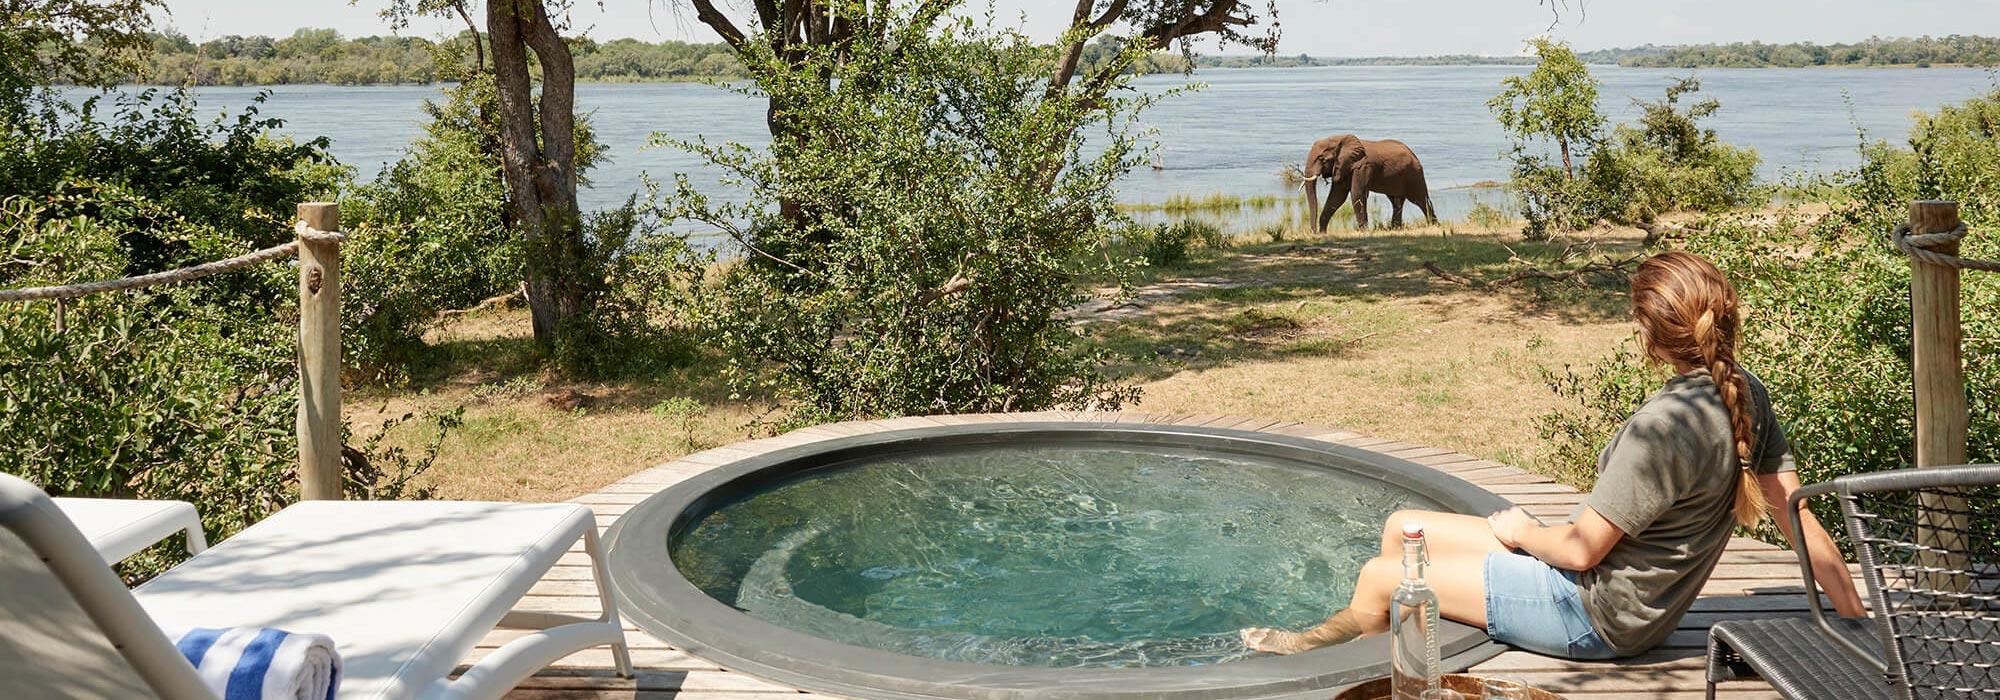 Victoria Falls River Lodge Plunge Pool